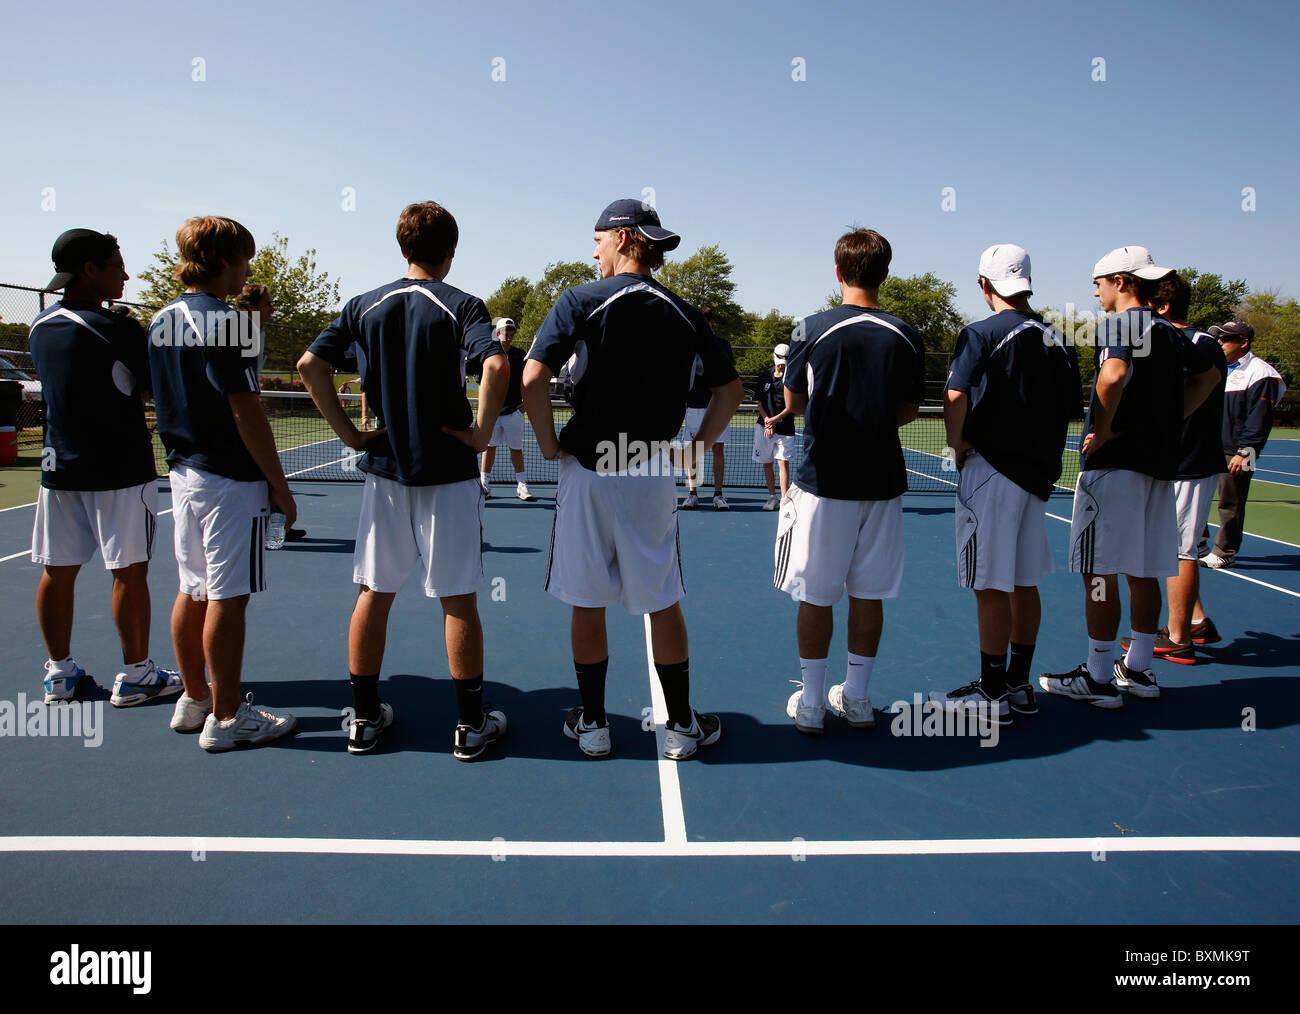 American high school tennis team - Stock Image